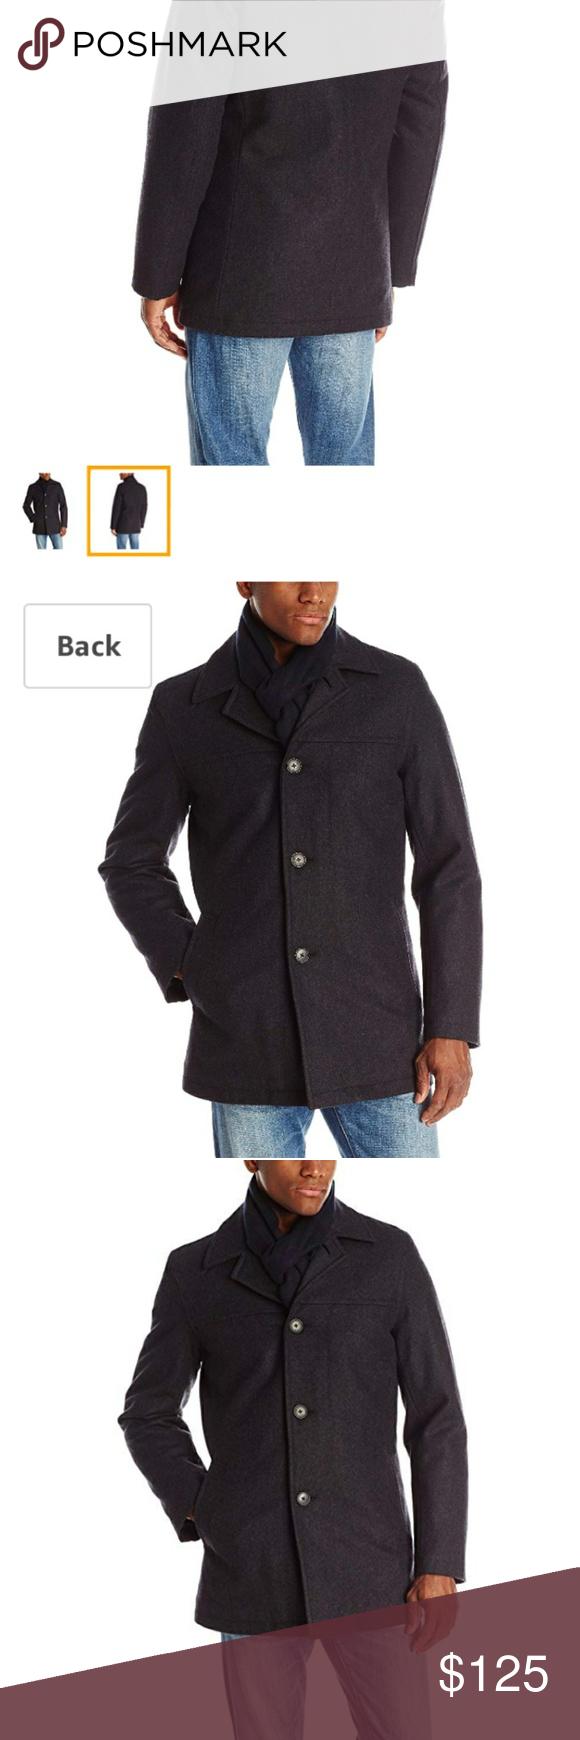 Tommy Hilfiger Men/'s Wool Melton Walking Coat W// Attached Scarf